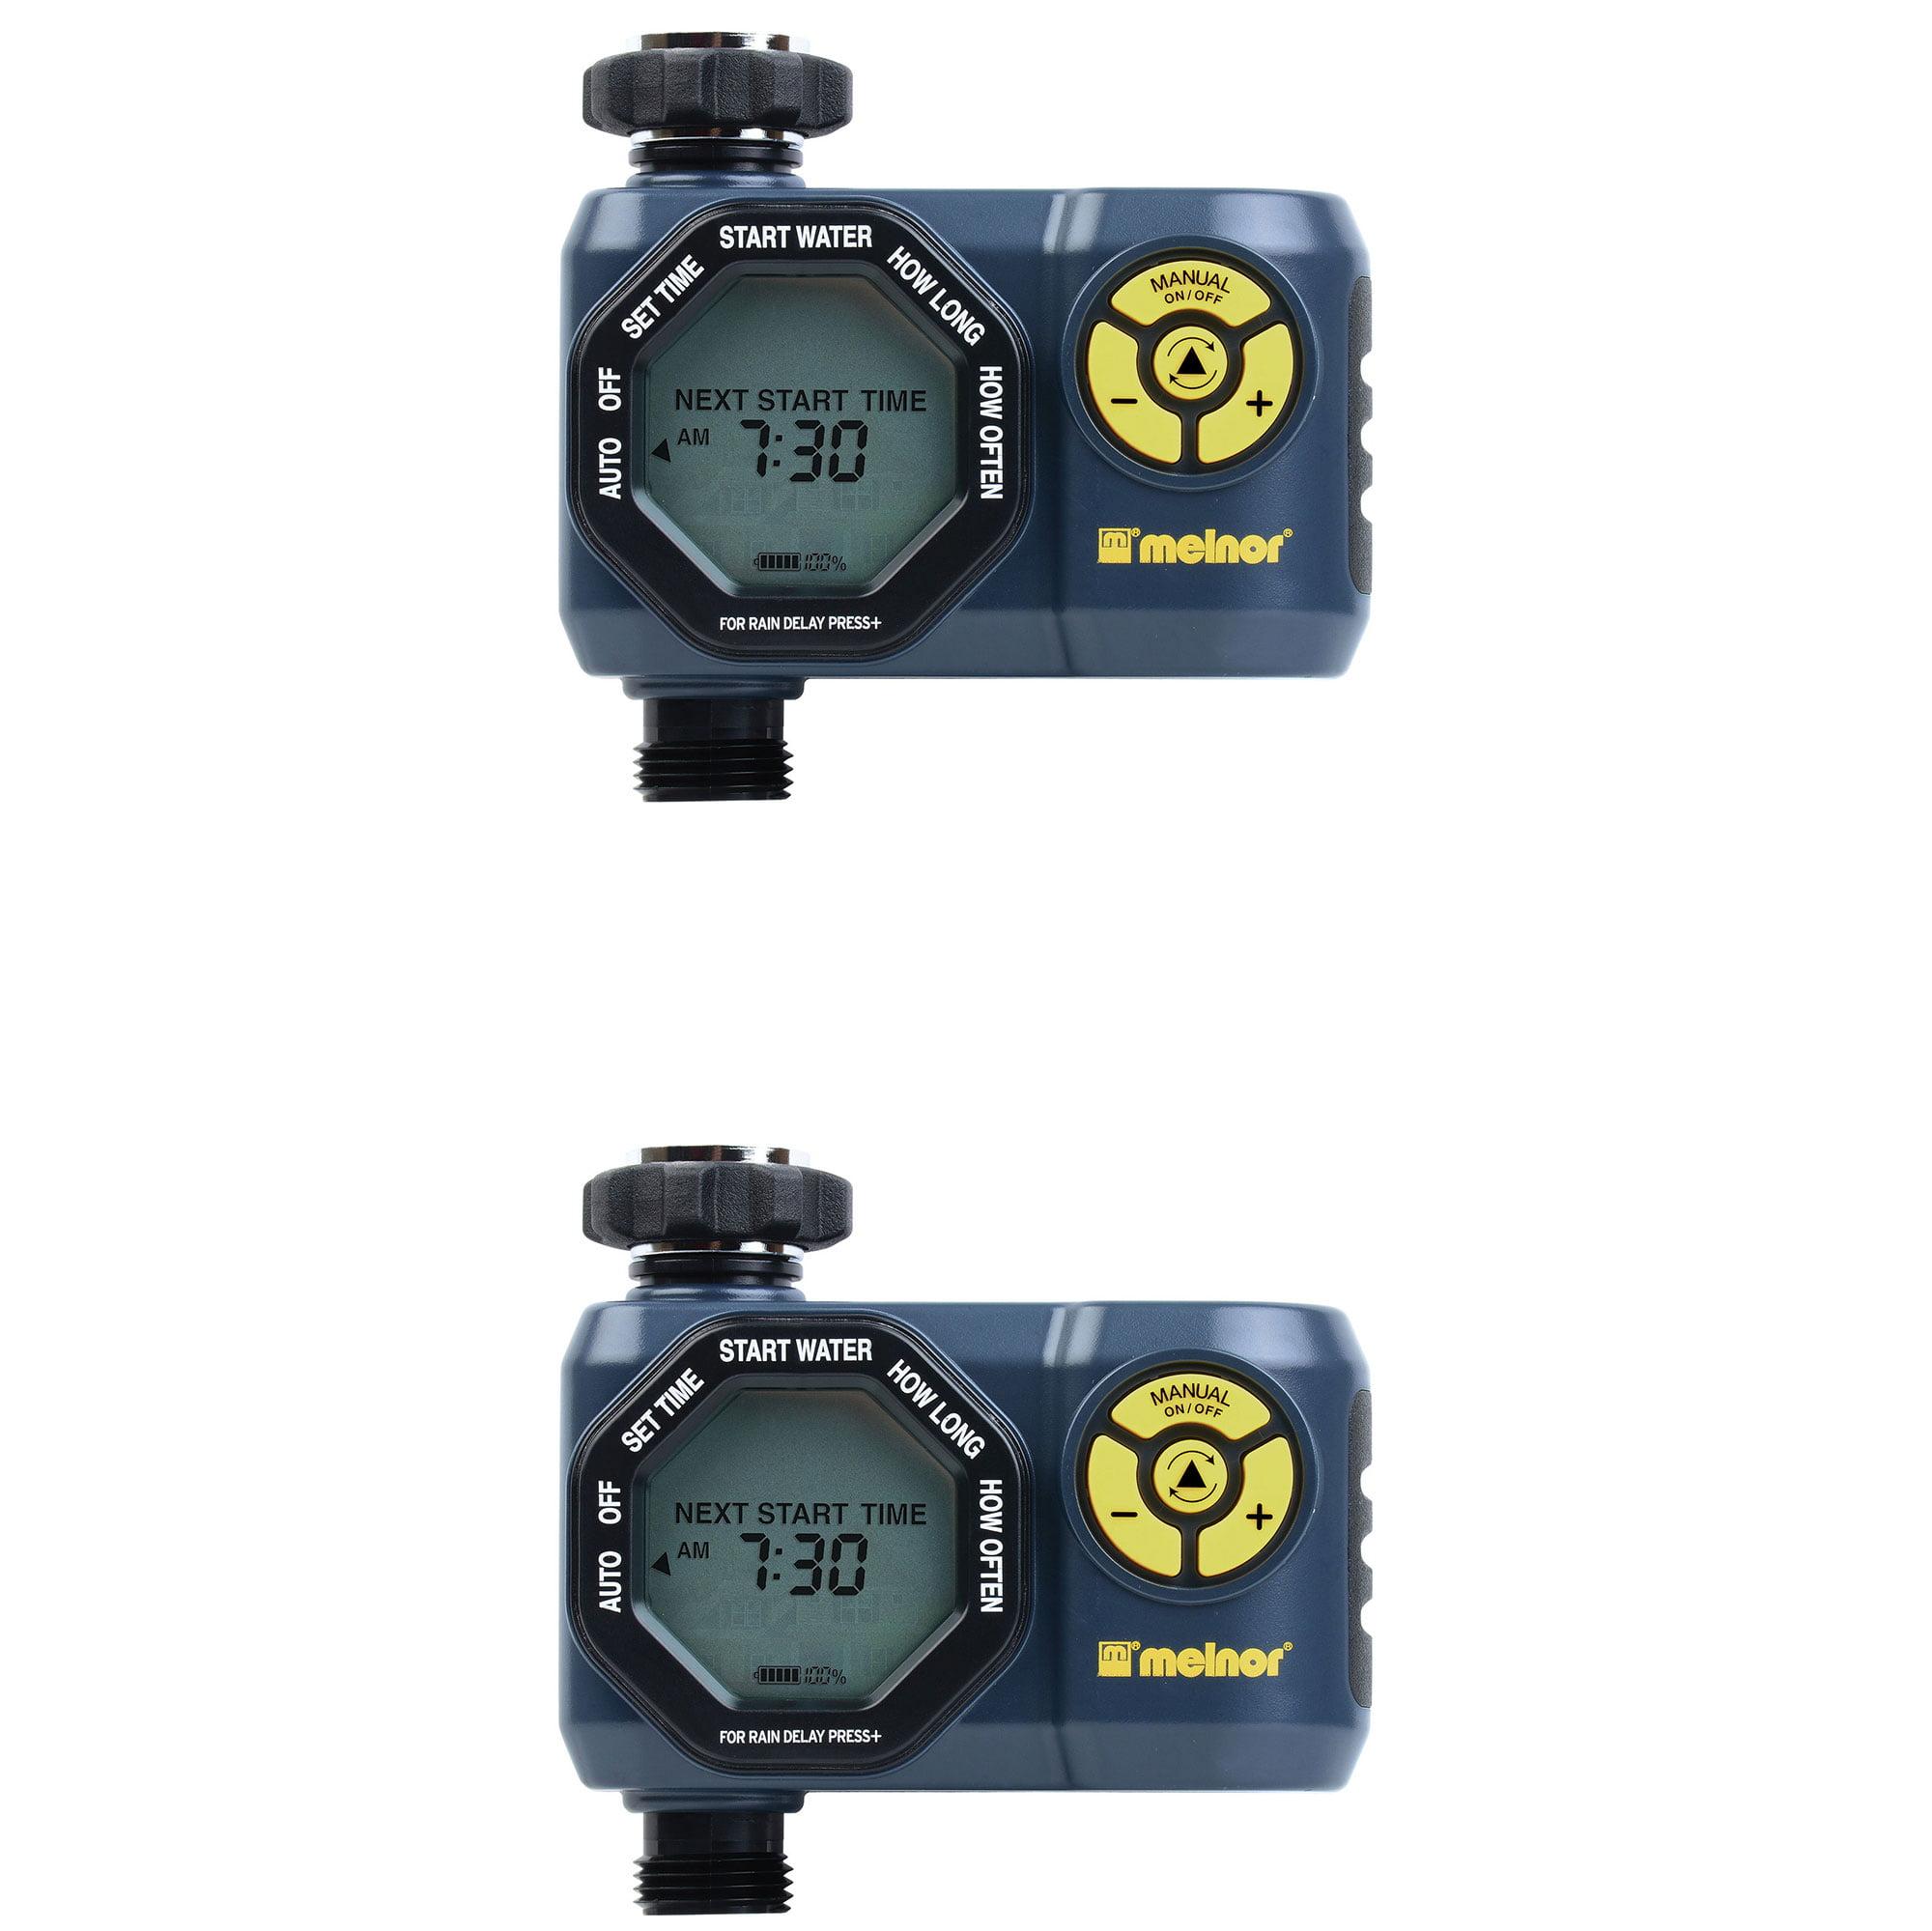 Melnor Digital 1 Zone Programmable Water Timer & Controller for Garden (2 Pack)